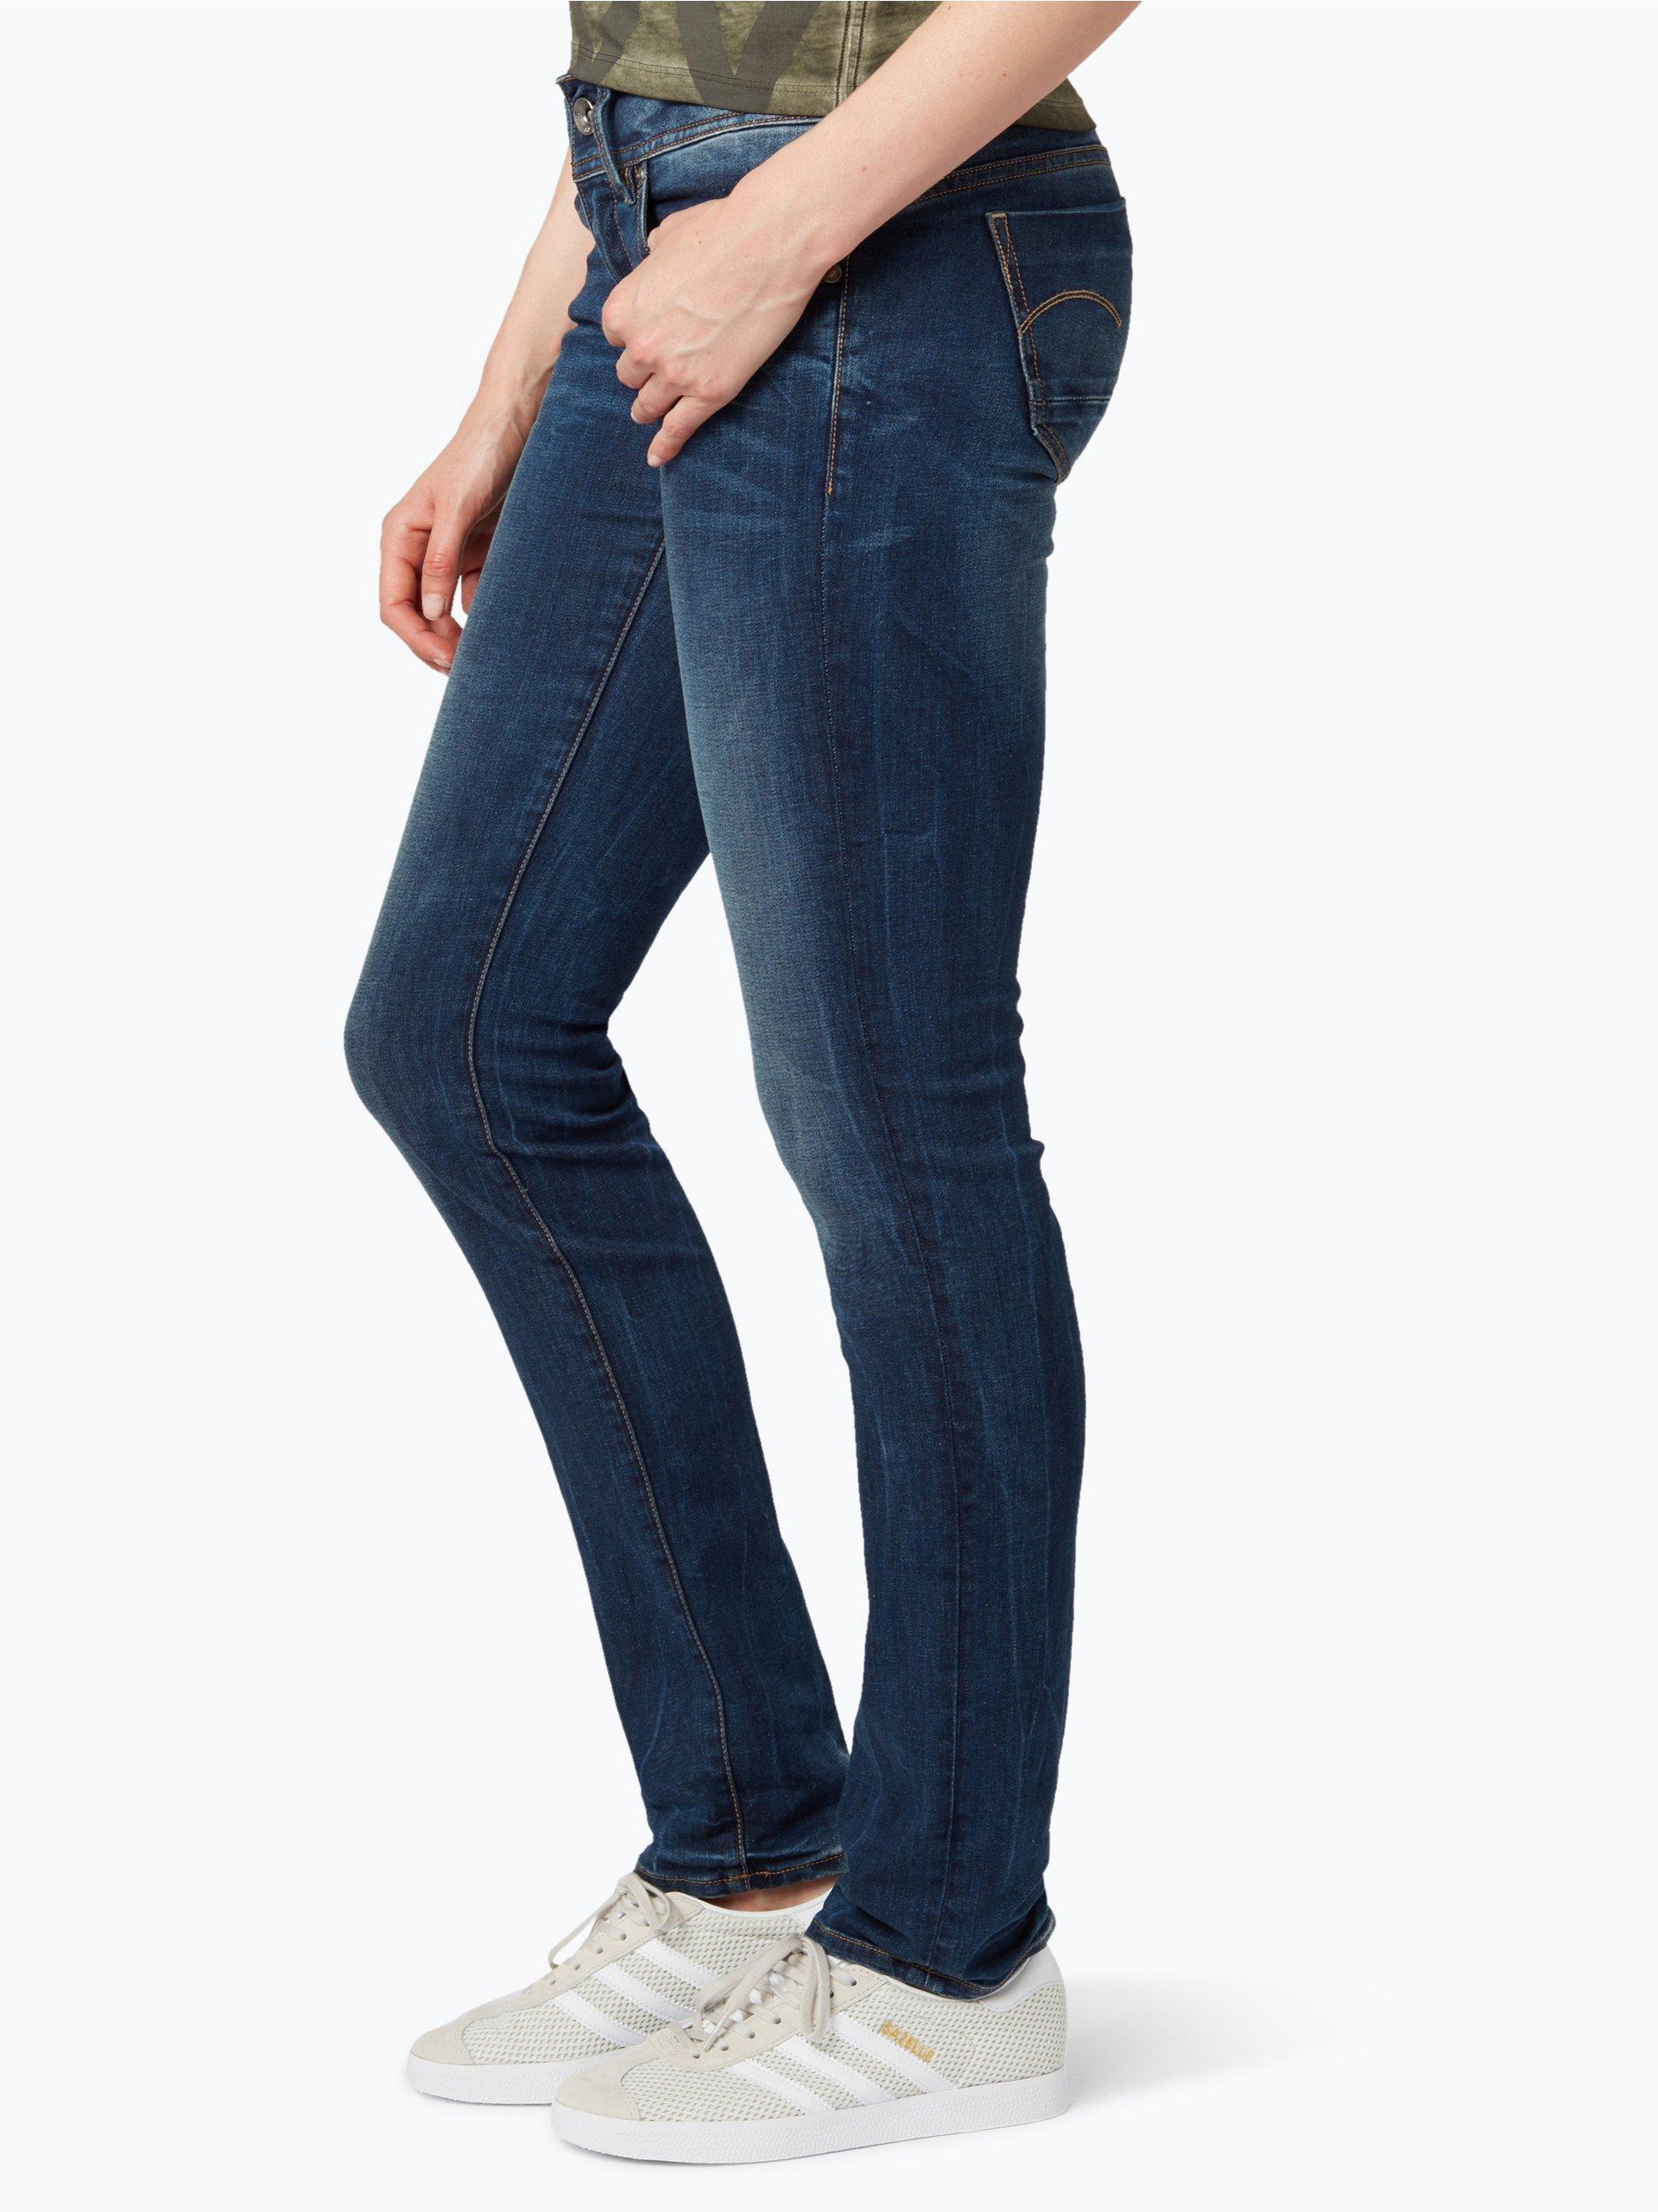 G-Star RAW Damen Jeans - Midge